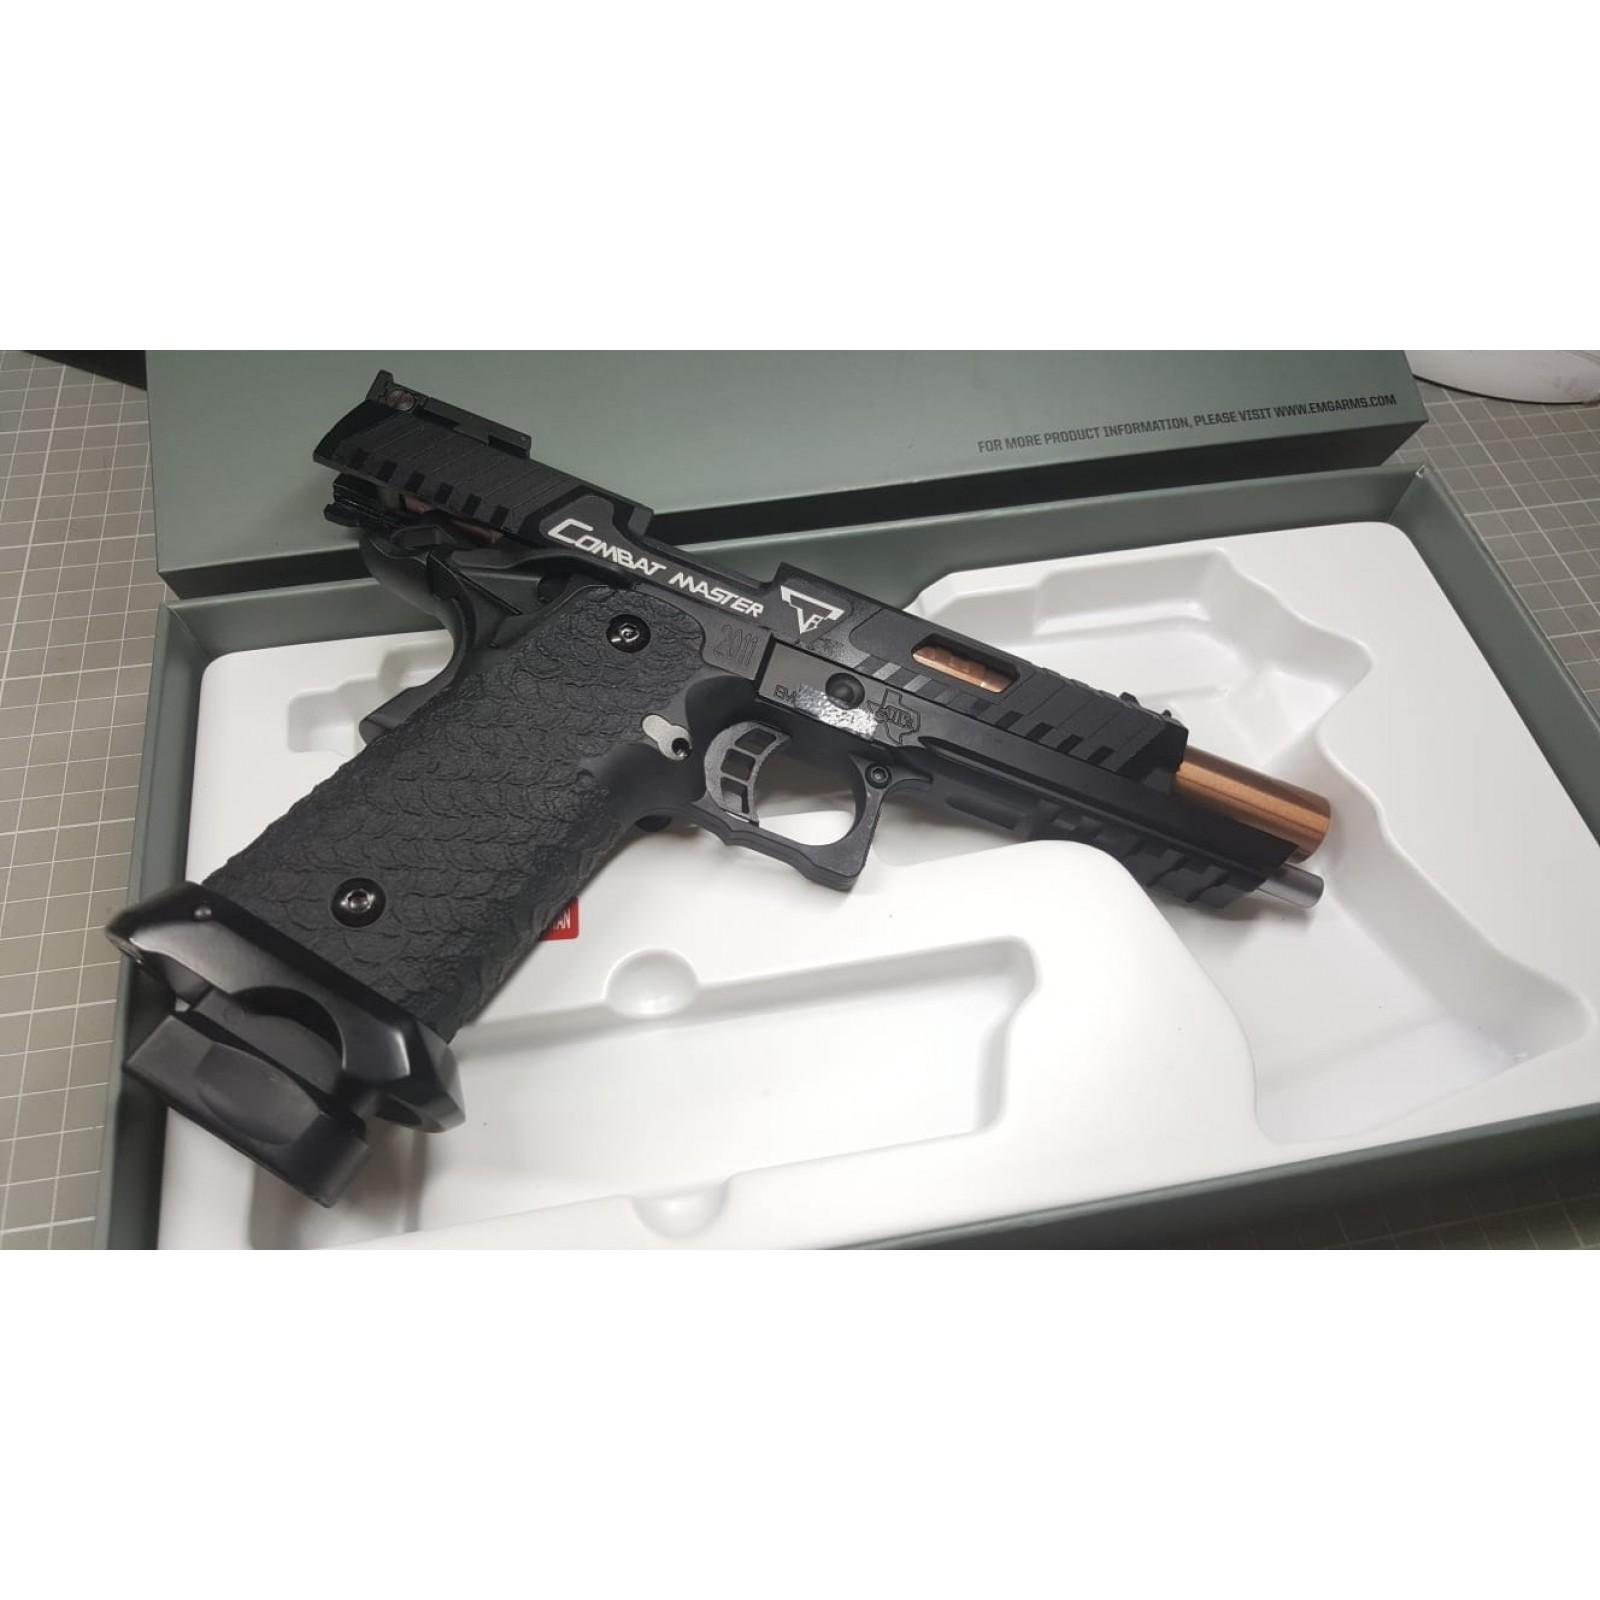 EMG STI TTI Combat Master 2011 GBB Pistol (4 wave shipment